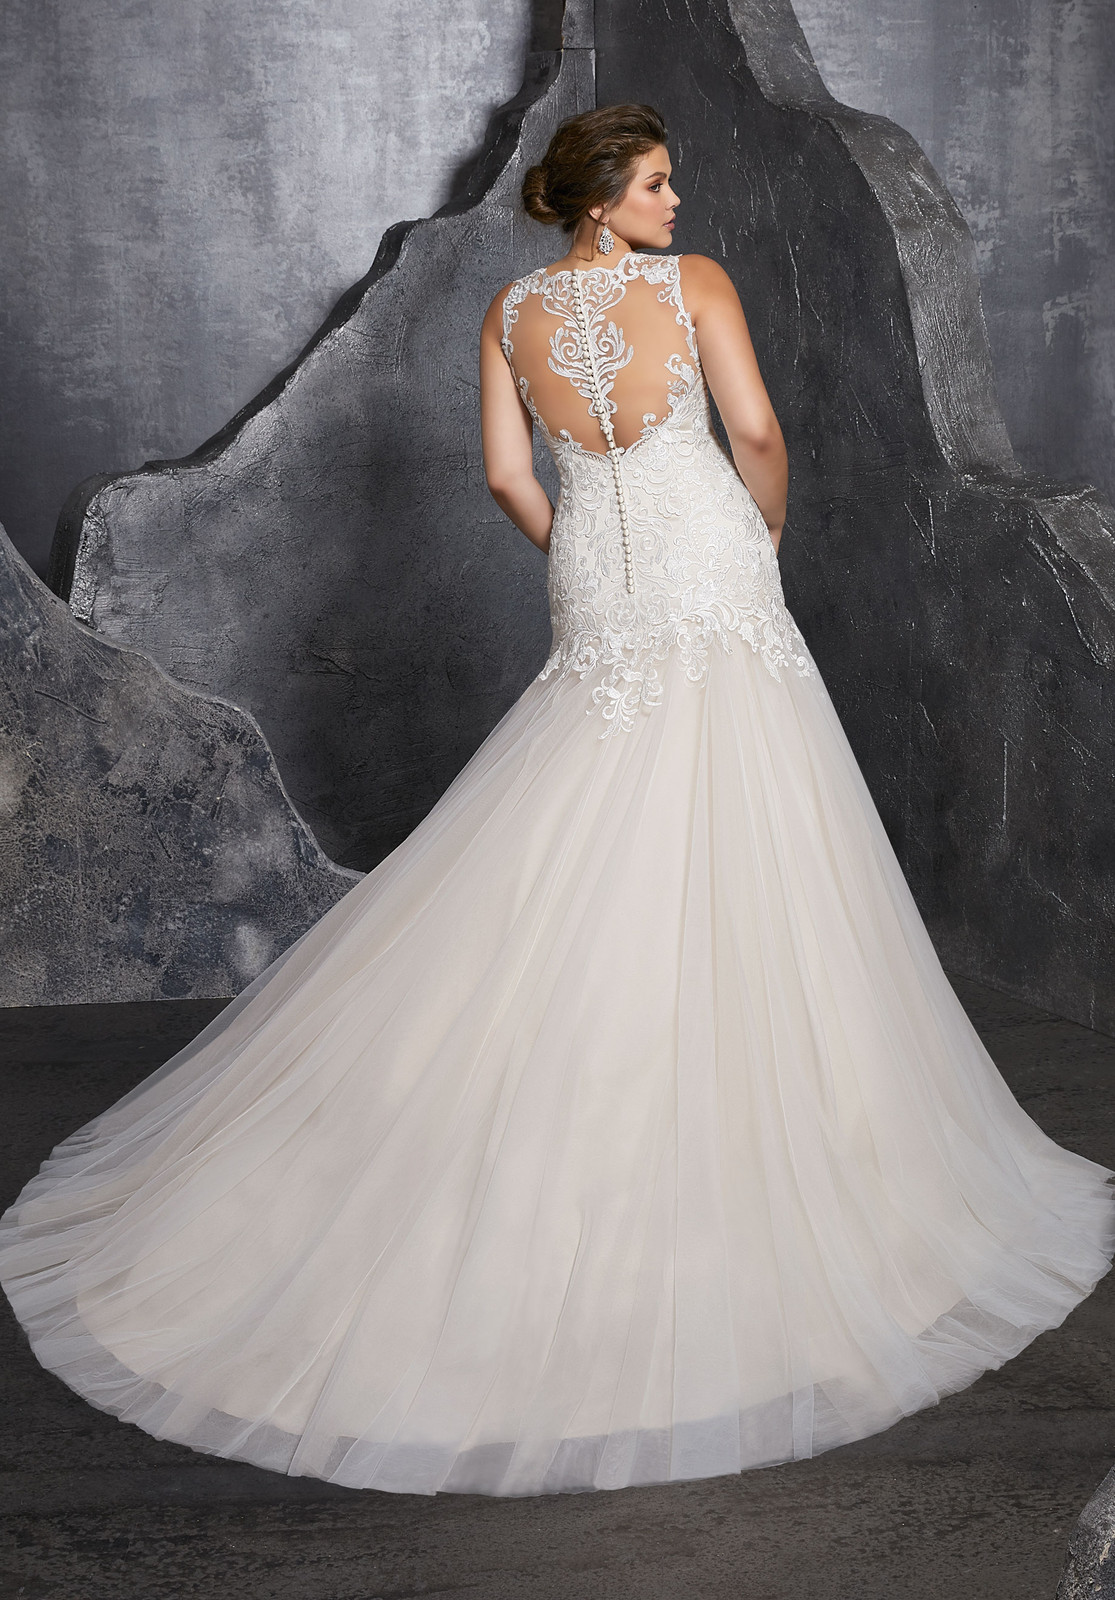 Plus-Size Wedding Dresses | San Antonio, Texas